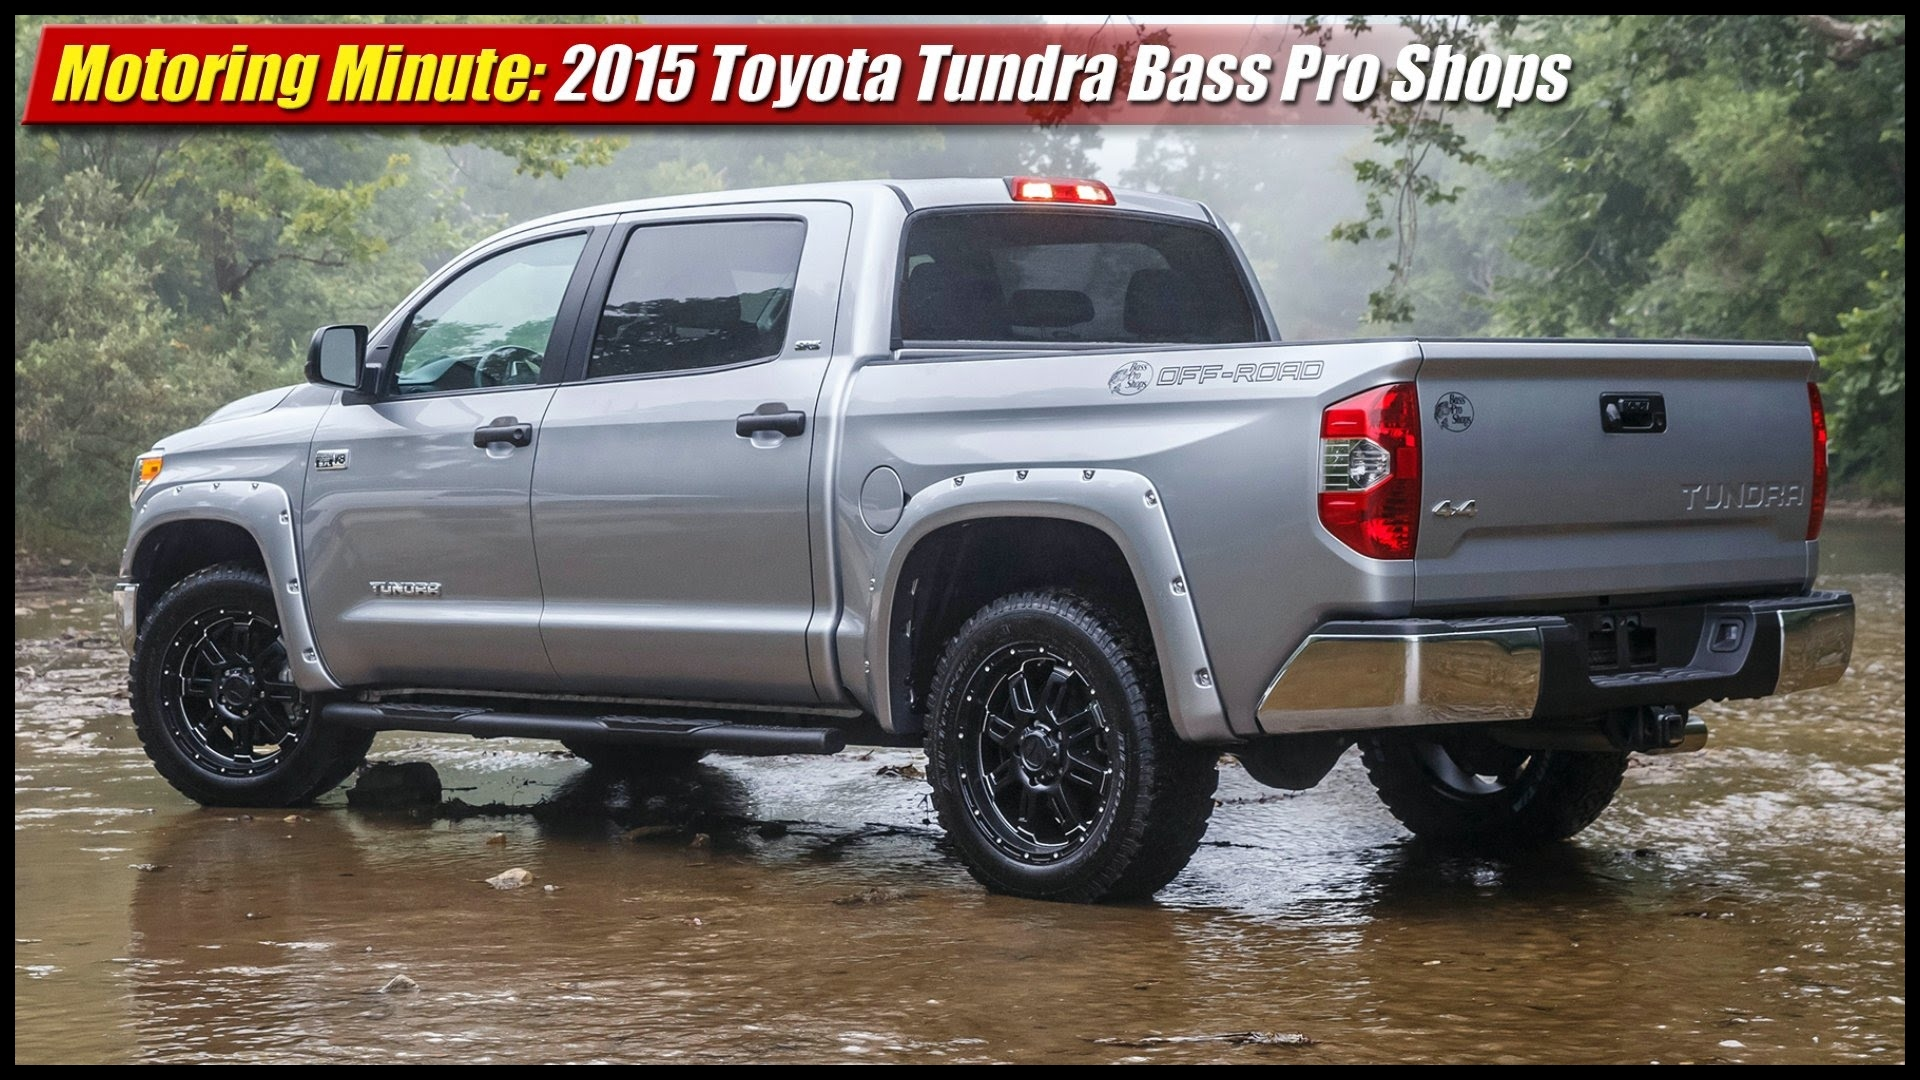 Motoring Minute 2015 Toyota Tundra Bass Pro Shops f Road Edition TestDriven TV